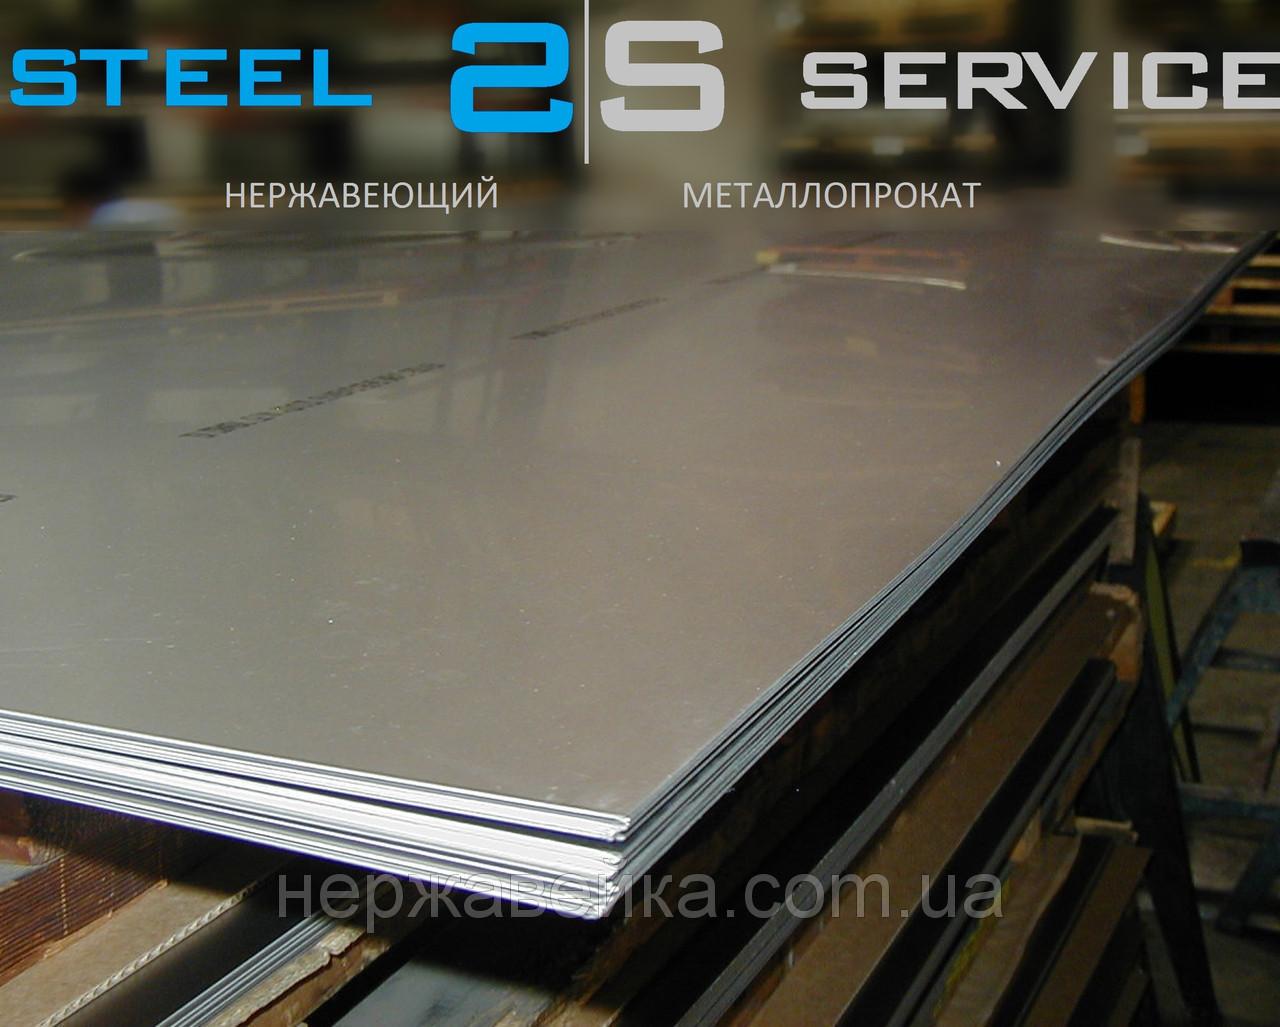 Нержавеющий лист 0,8х1250х2500мм AISI 430(12Х17) 2B - матовый, технический